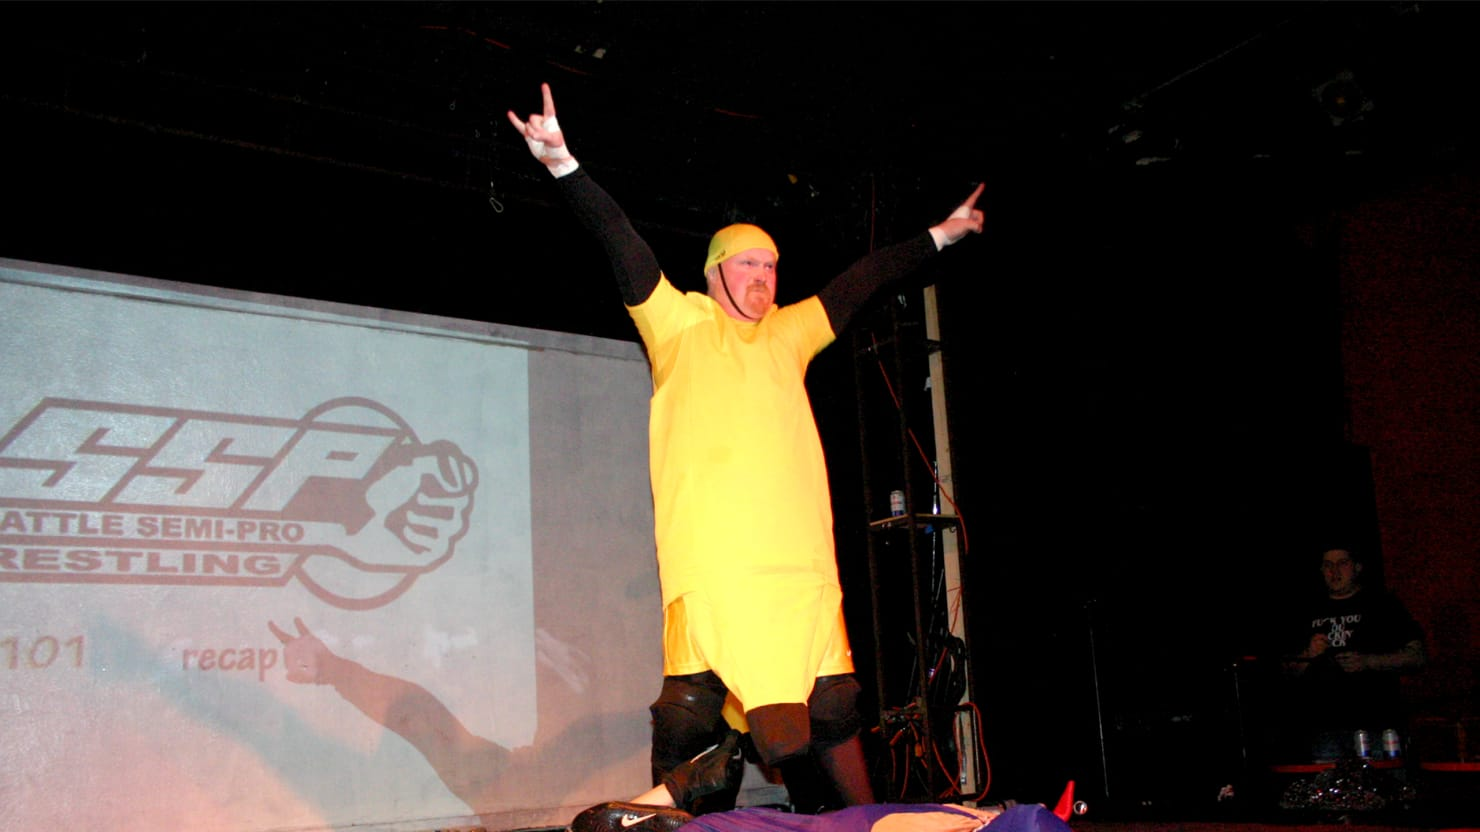 Revenge of the Banana-Suited Wrestler: The Craziest Wrestling Story Never Told